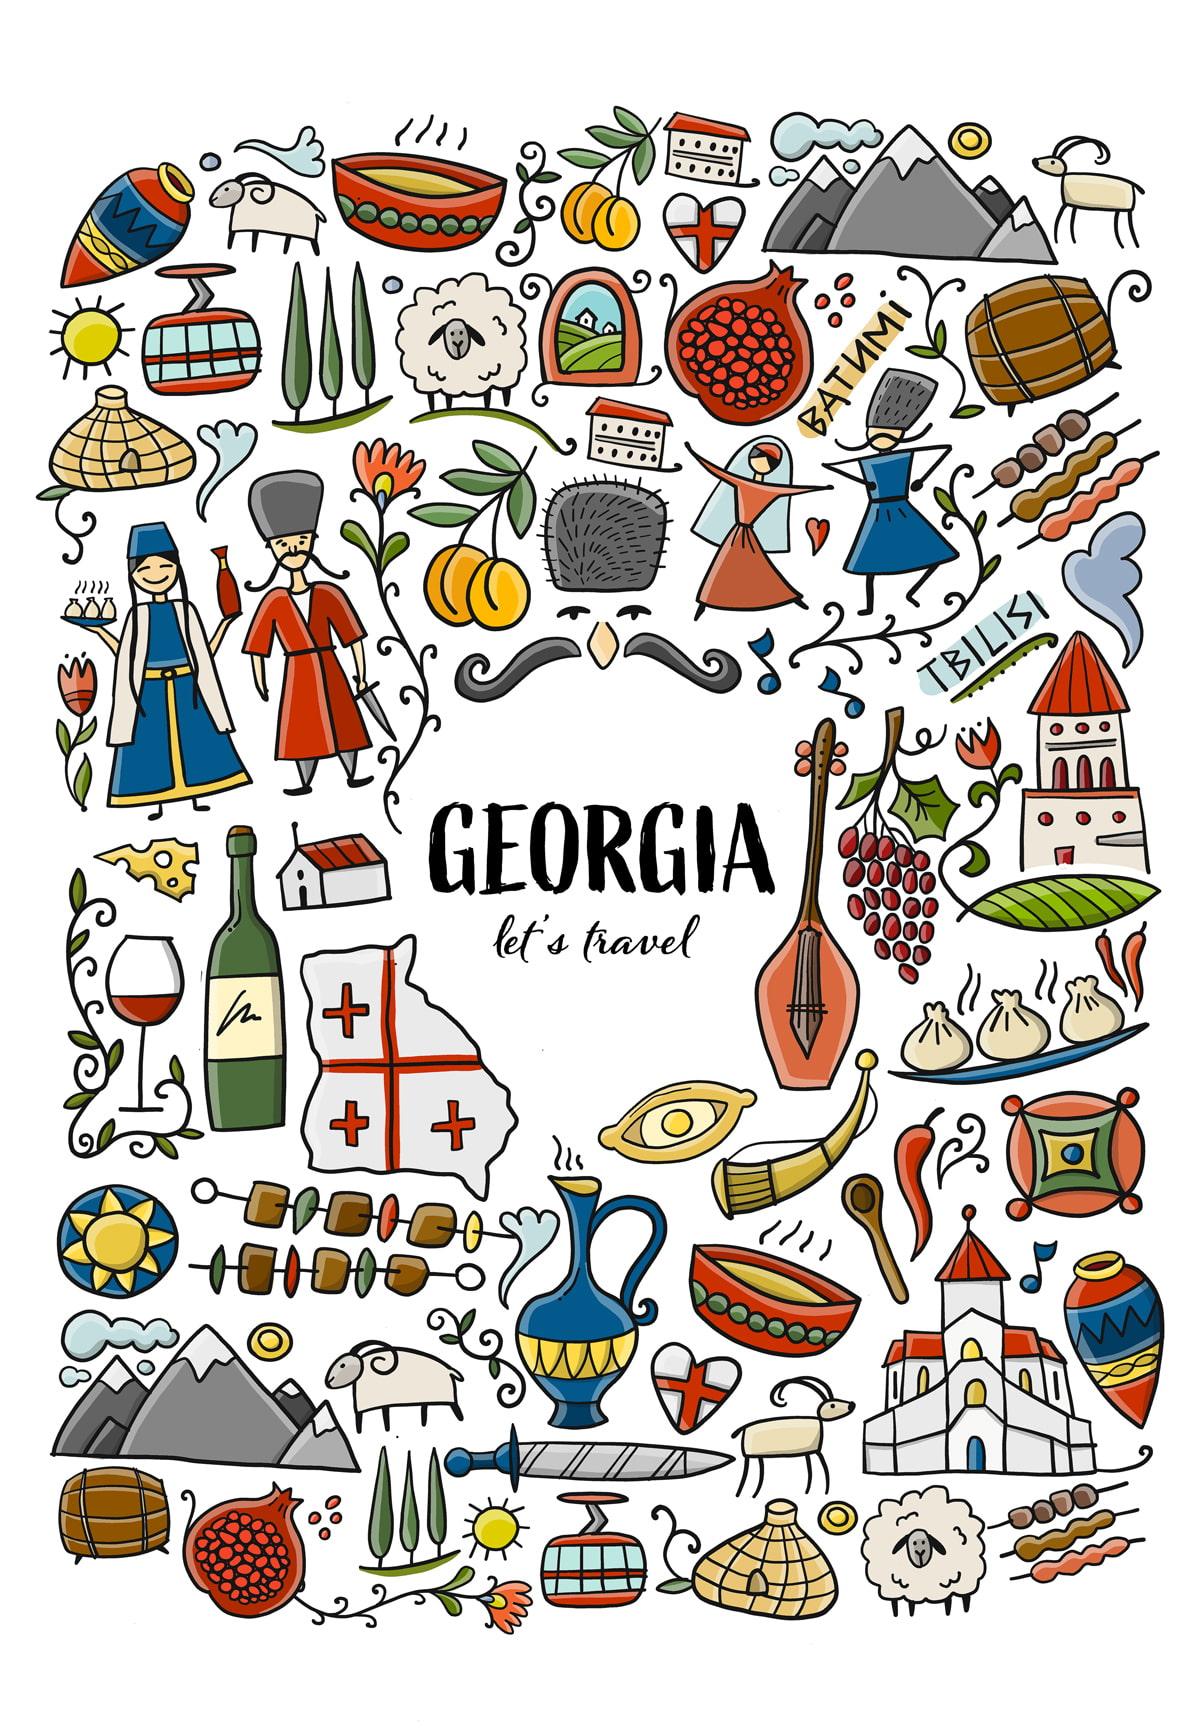 Georgia country illustration